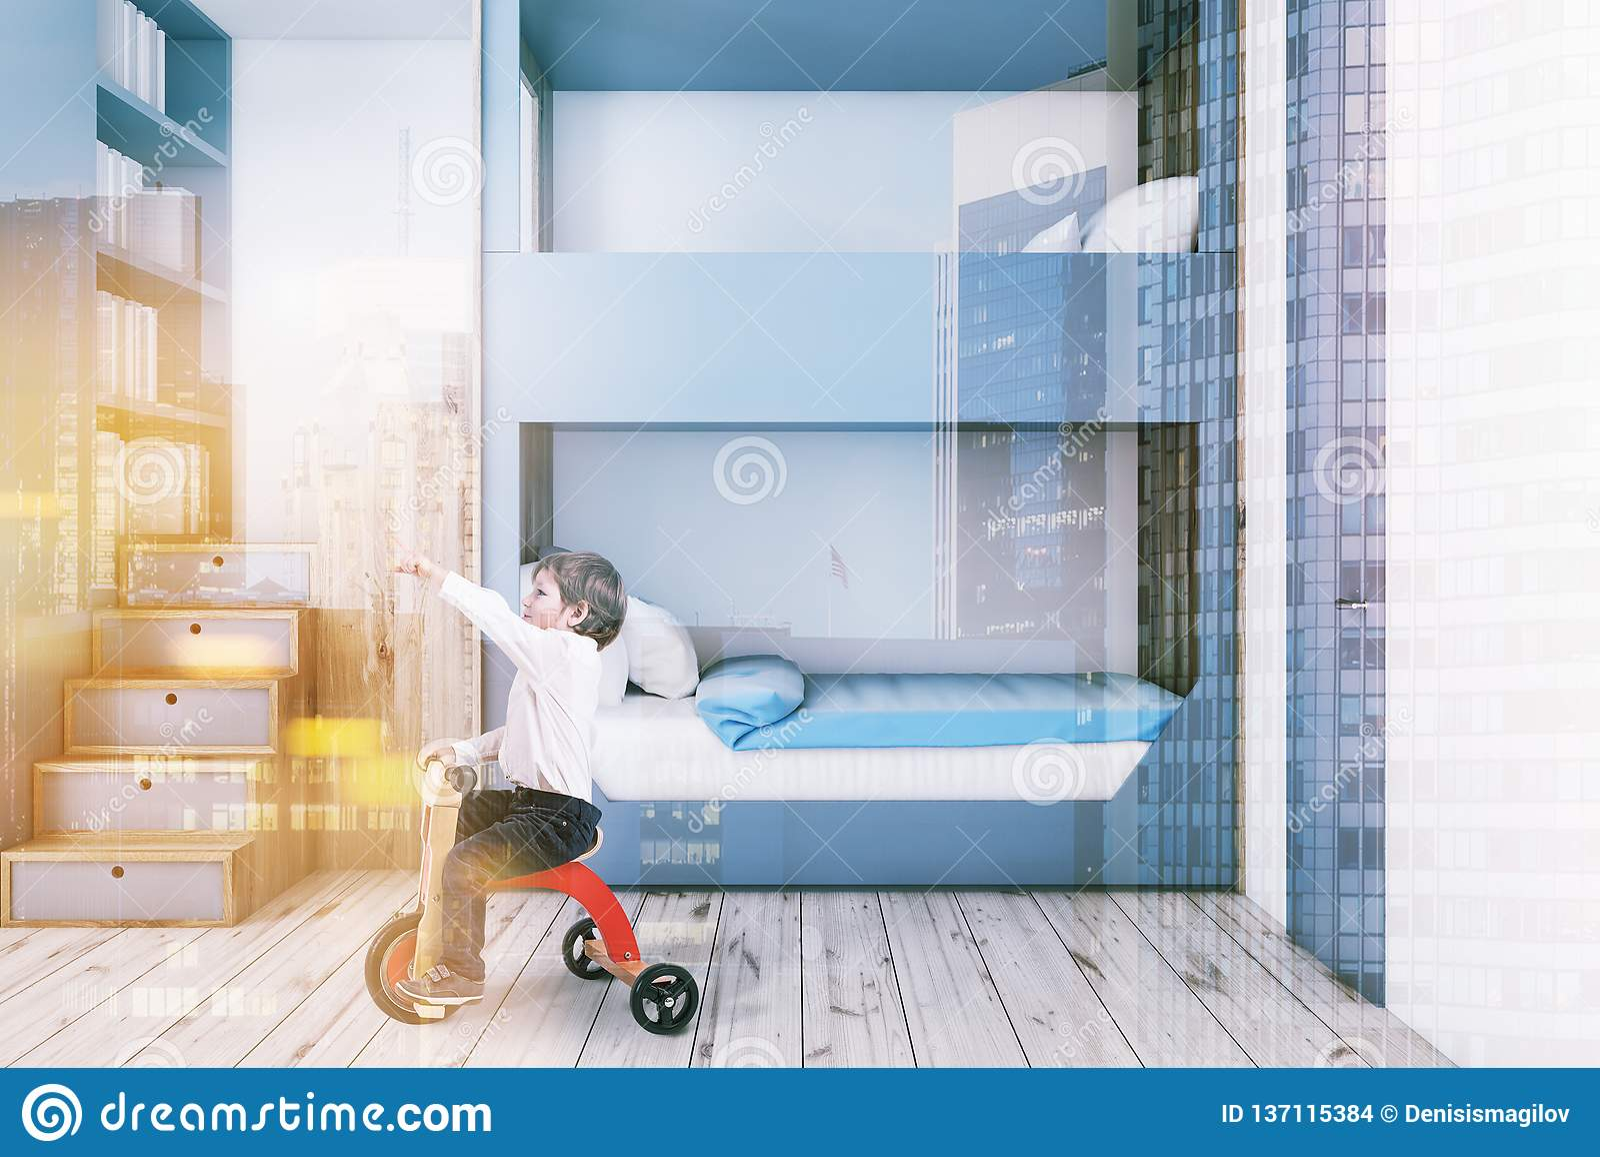 Gray Bunk Bed Bedroom Interior Boy Stock Photo Image Of Computer Indoor 137115384